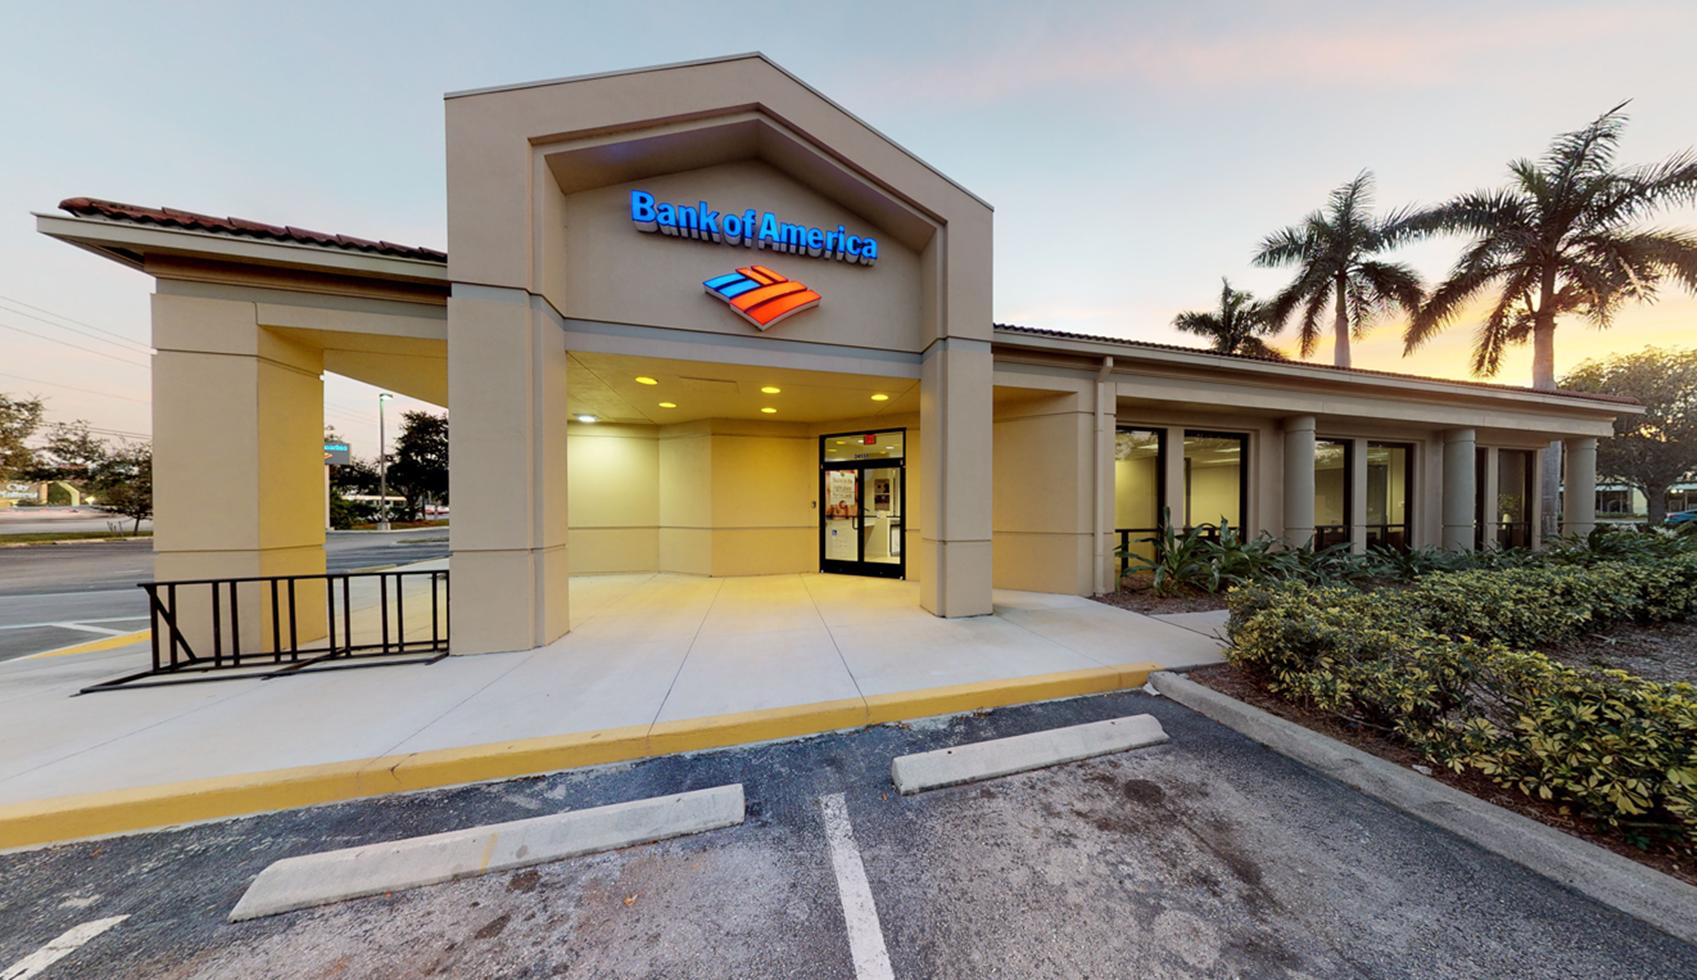 Bank of America financial center with drive-thru ATM | 24550 S Tamiami Trl, Bonita Springs, FL 34134